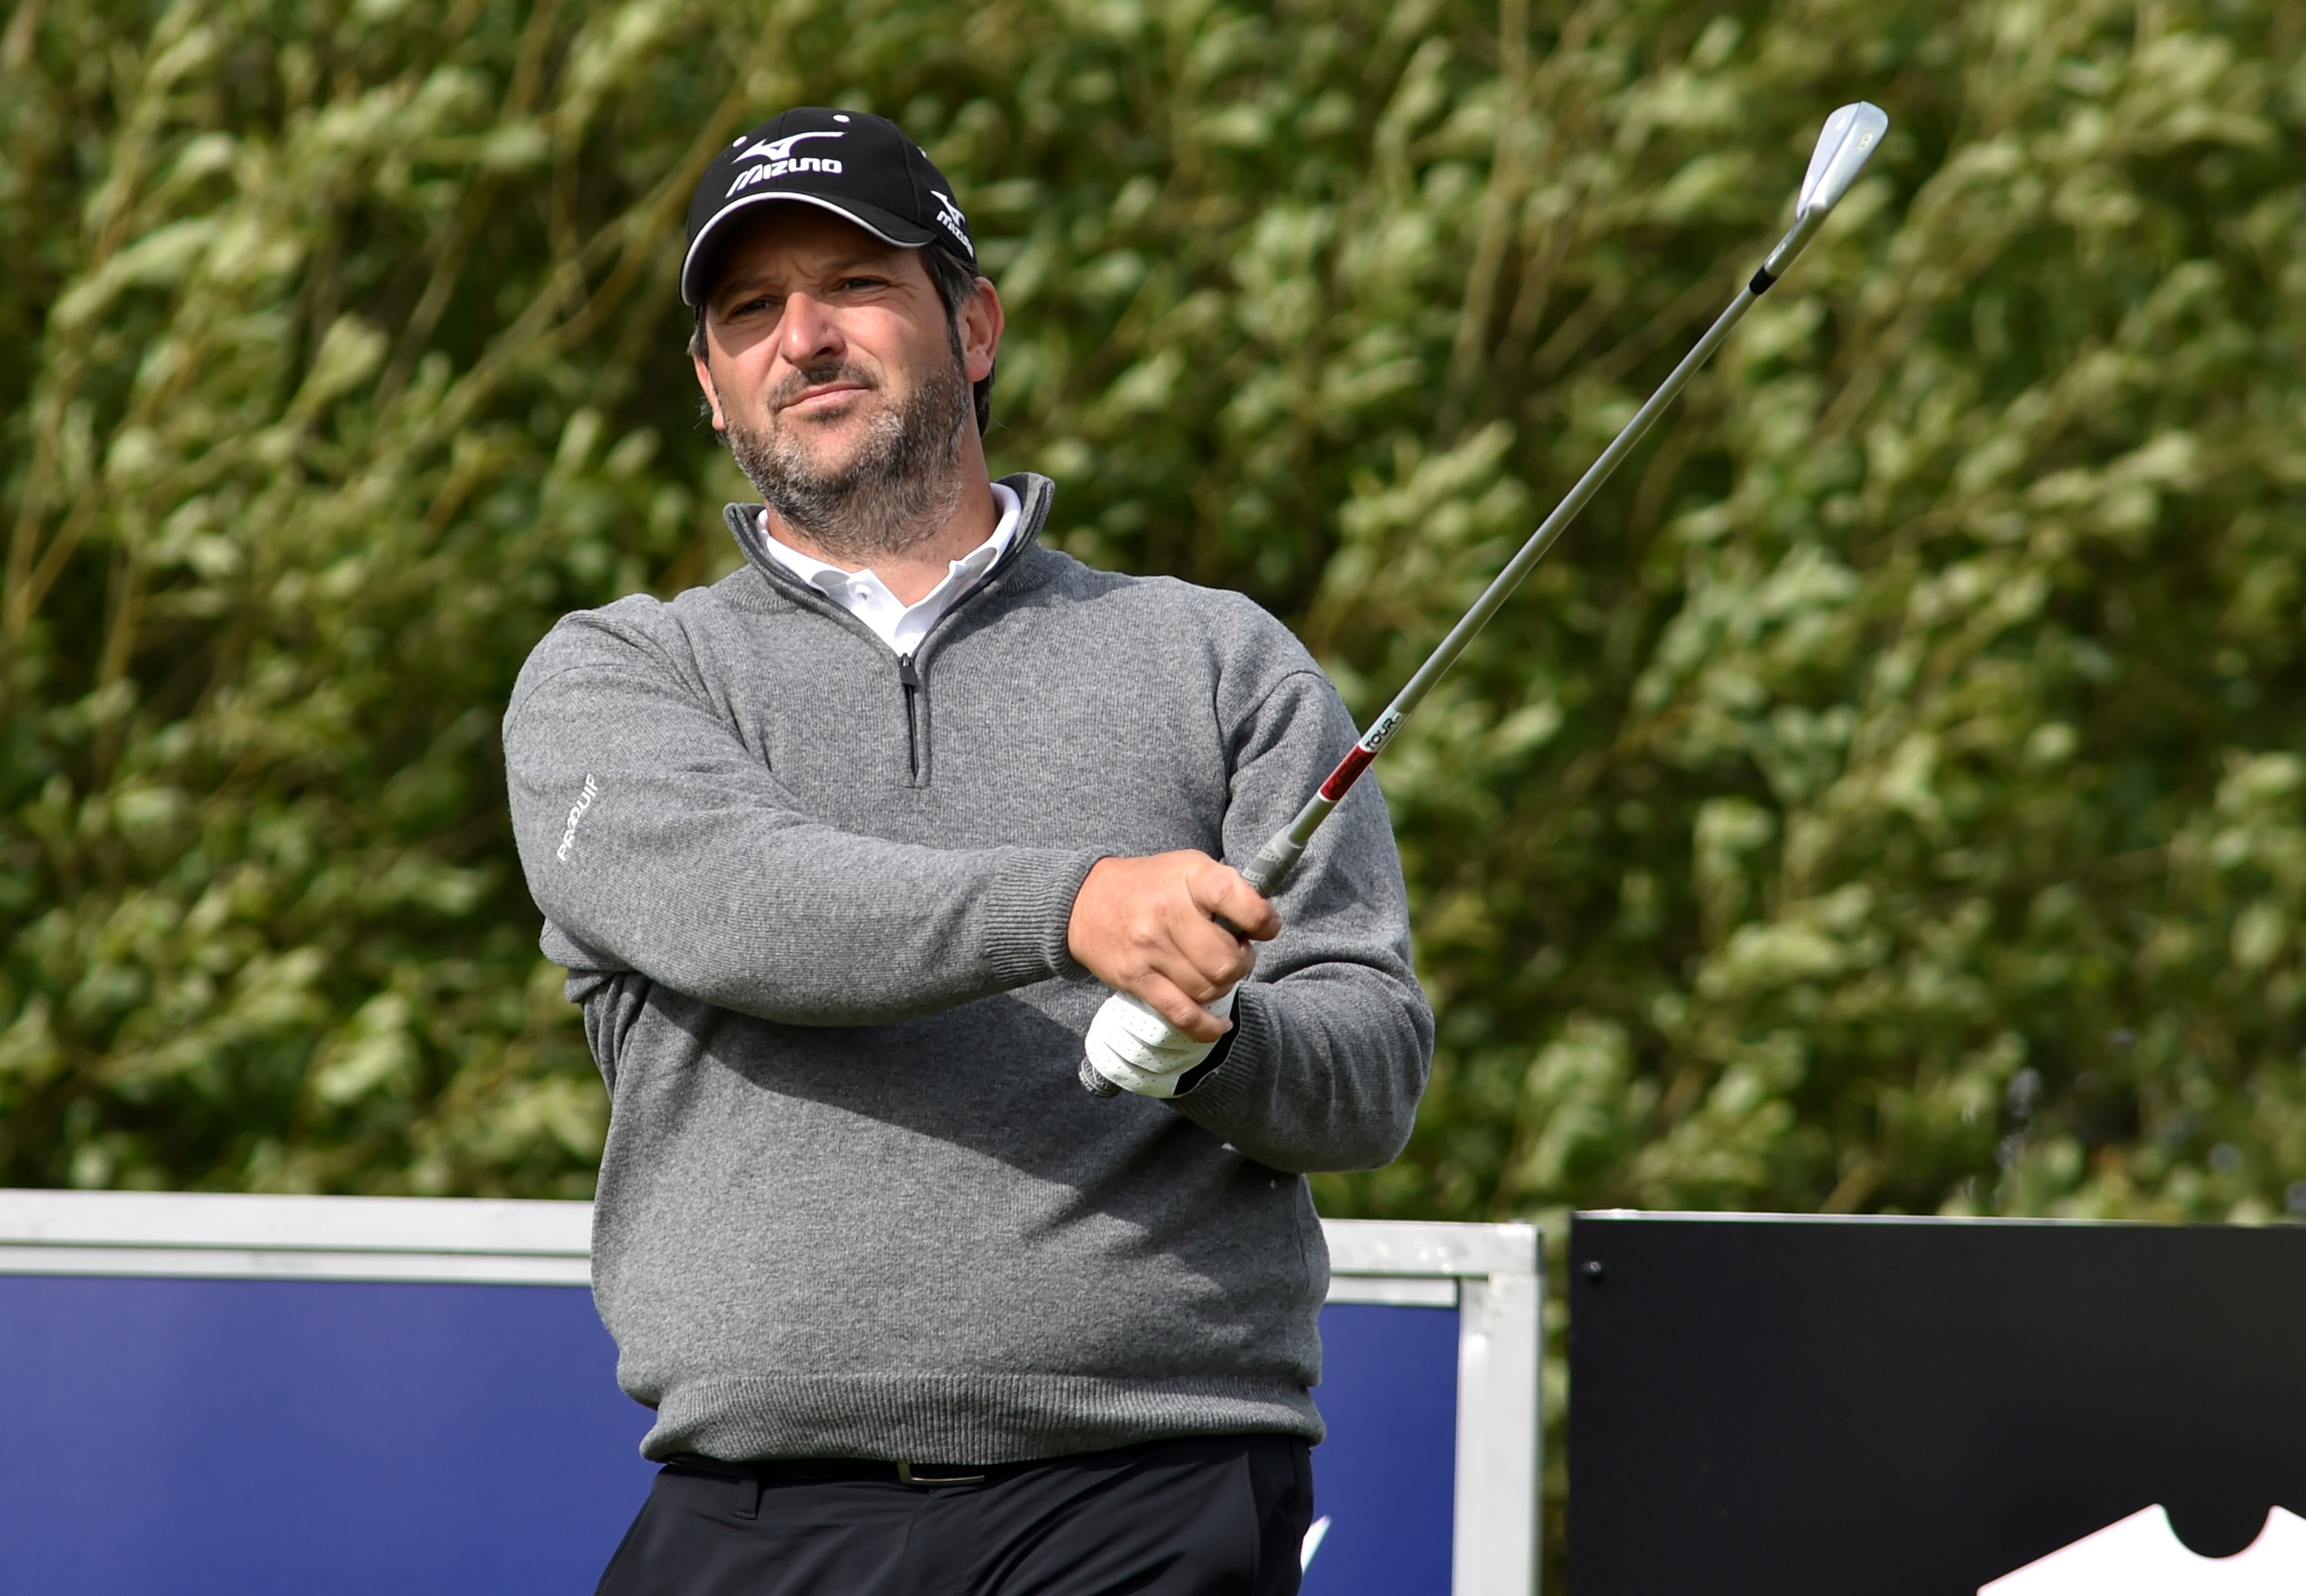 David Dixon won the Scottish Par 3 Championship